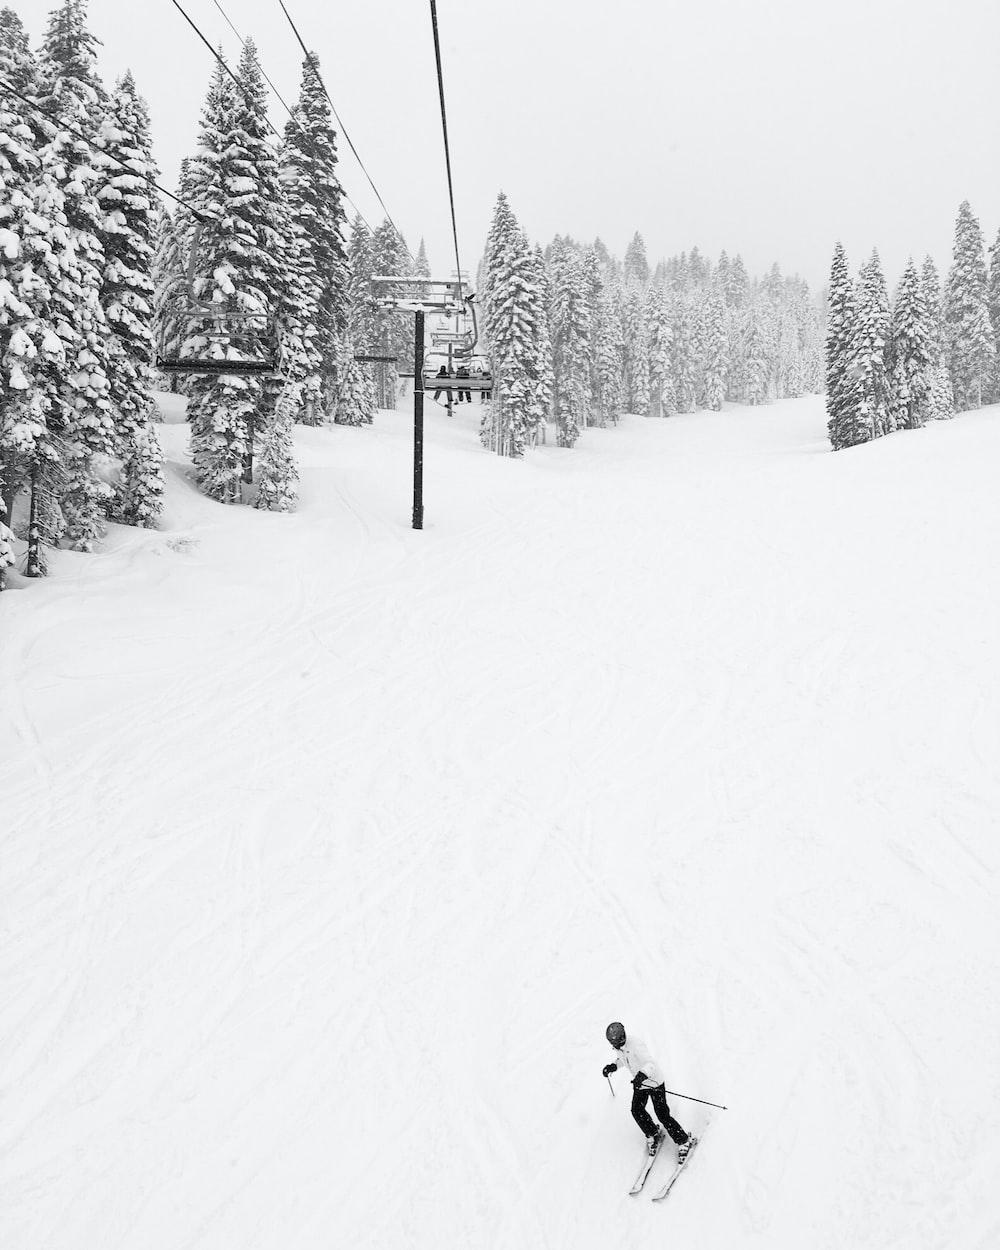 man doing ski near cable car